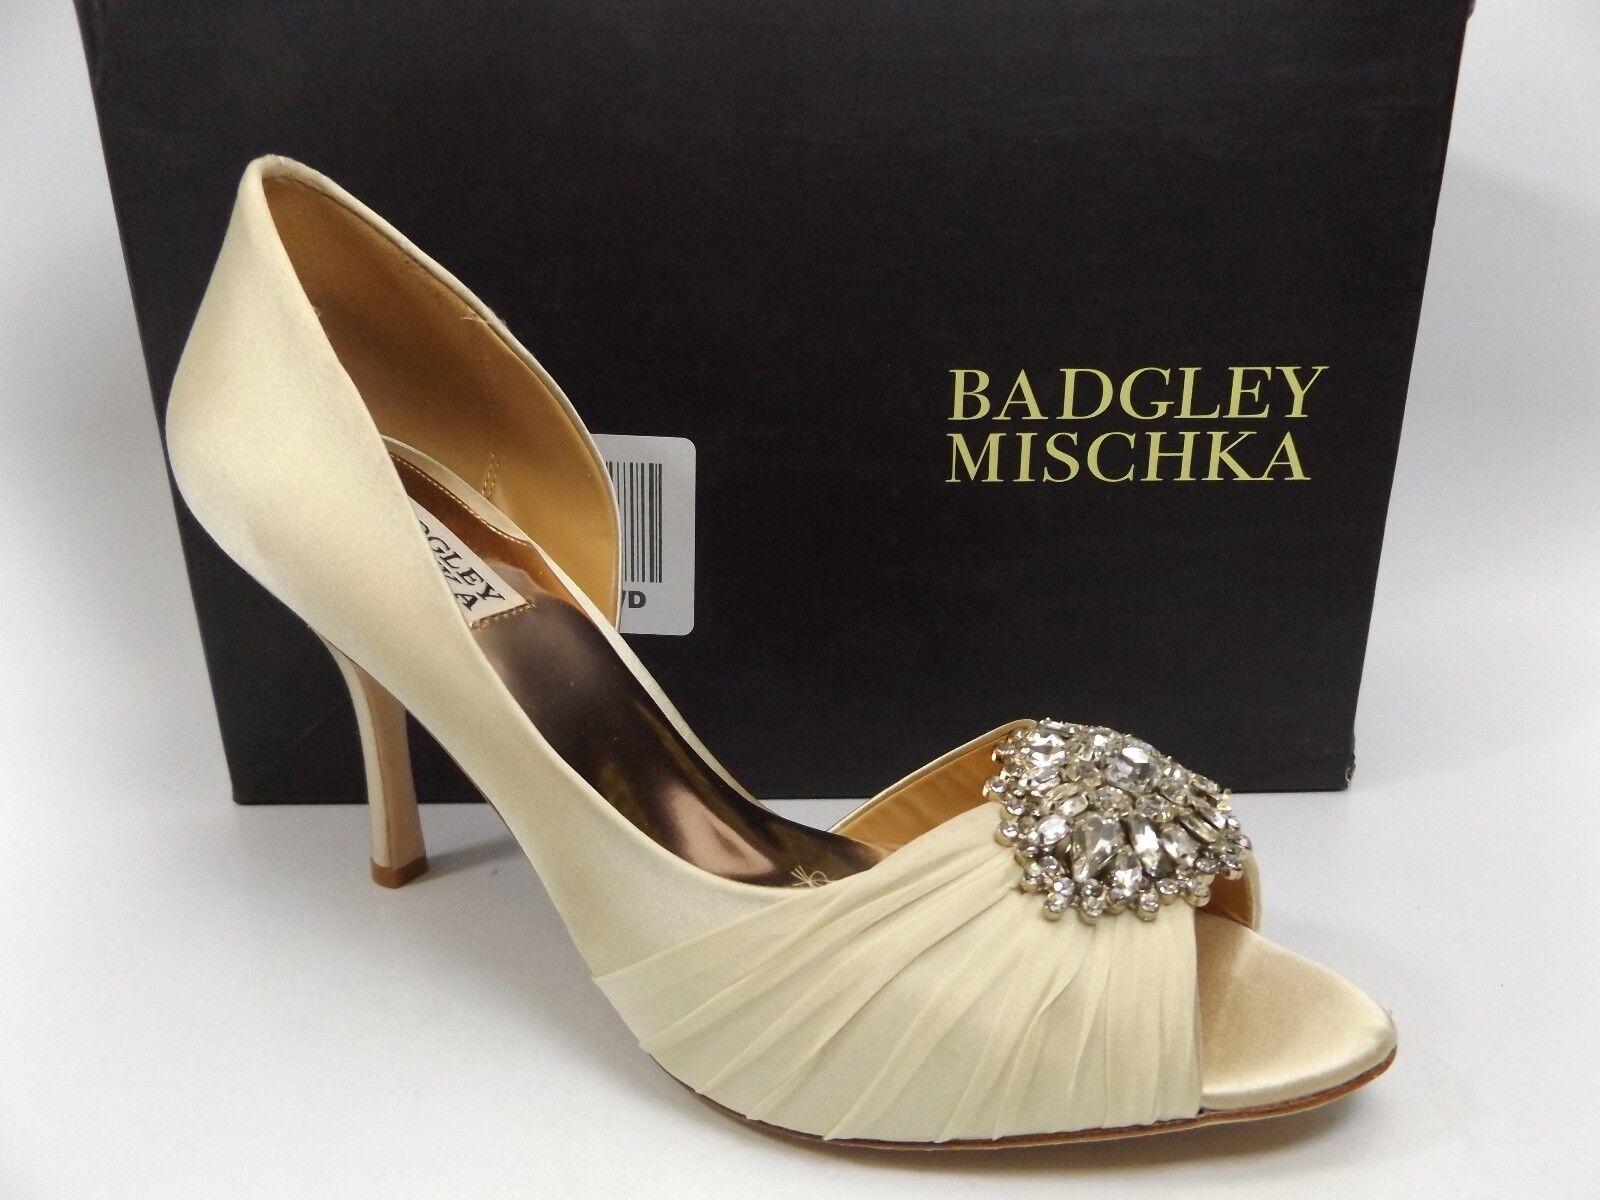 Badgley Mischka Femme Pearson Peep Toe D-Orsay Escarpins Van Satin Taille 10.0 m D7849